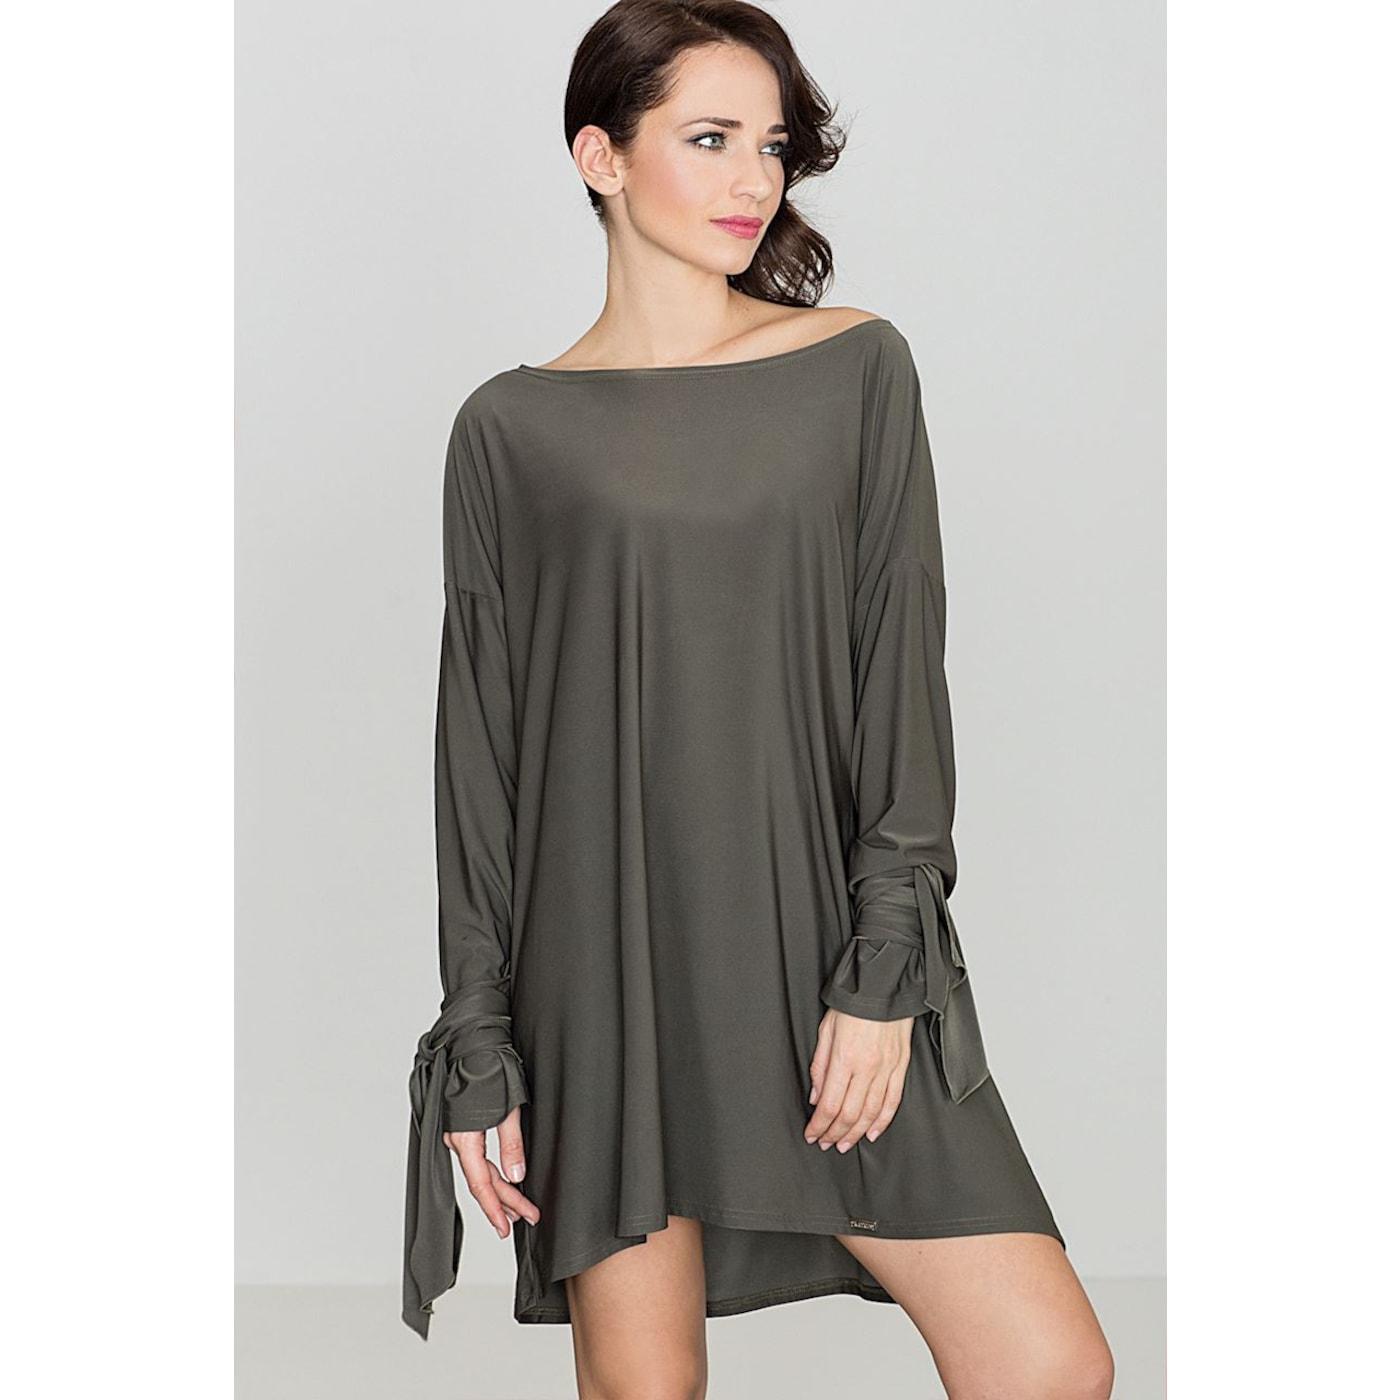 Katrus Womans Dress K439 dámské Olive green S